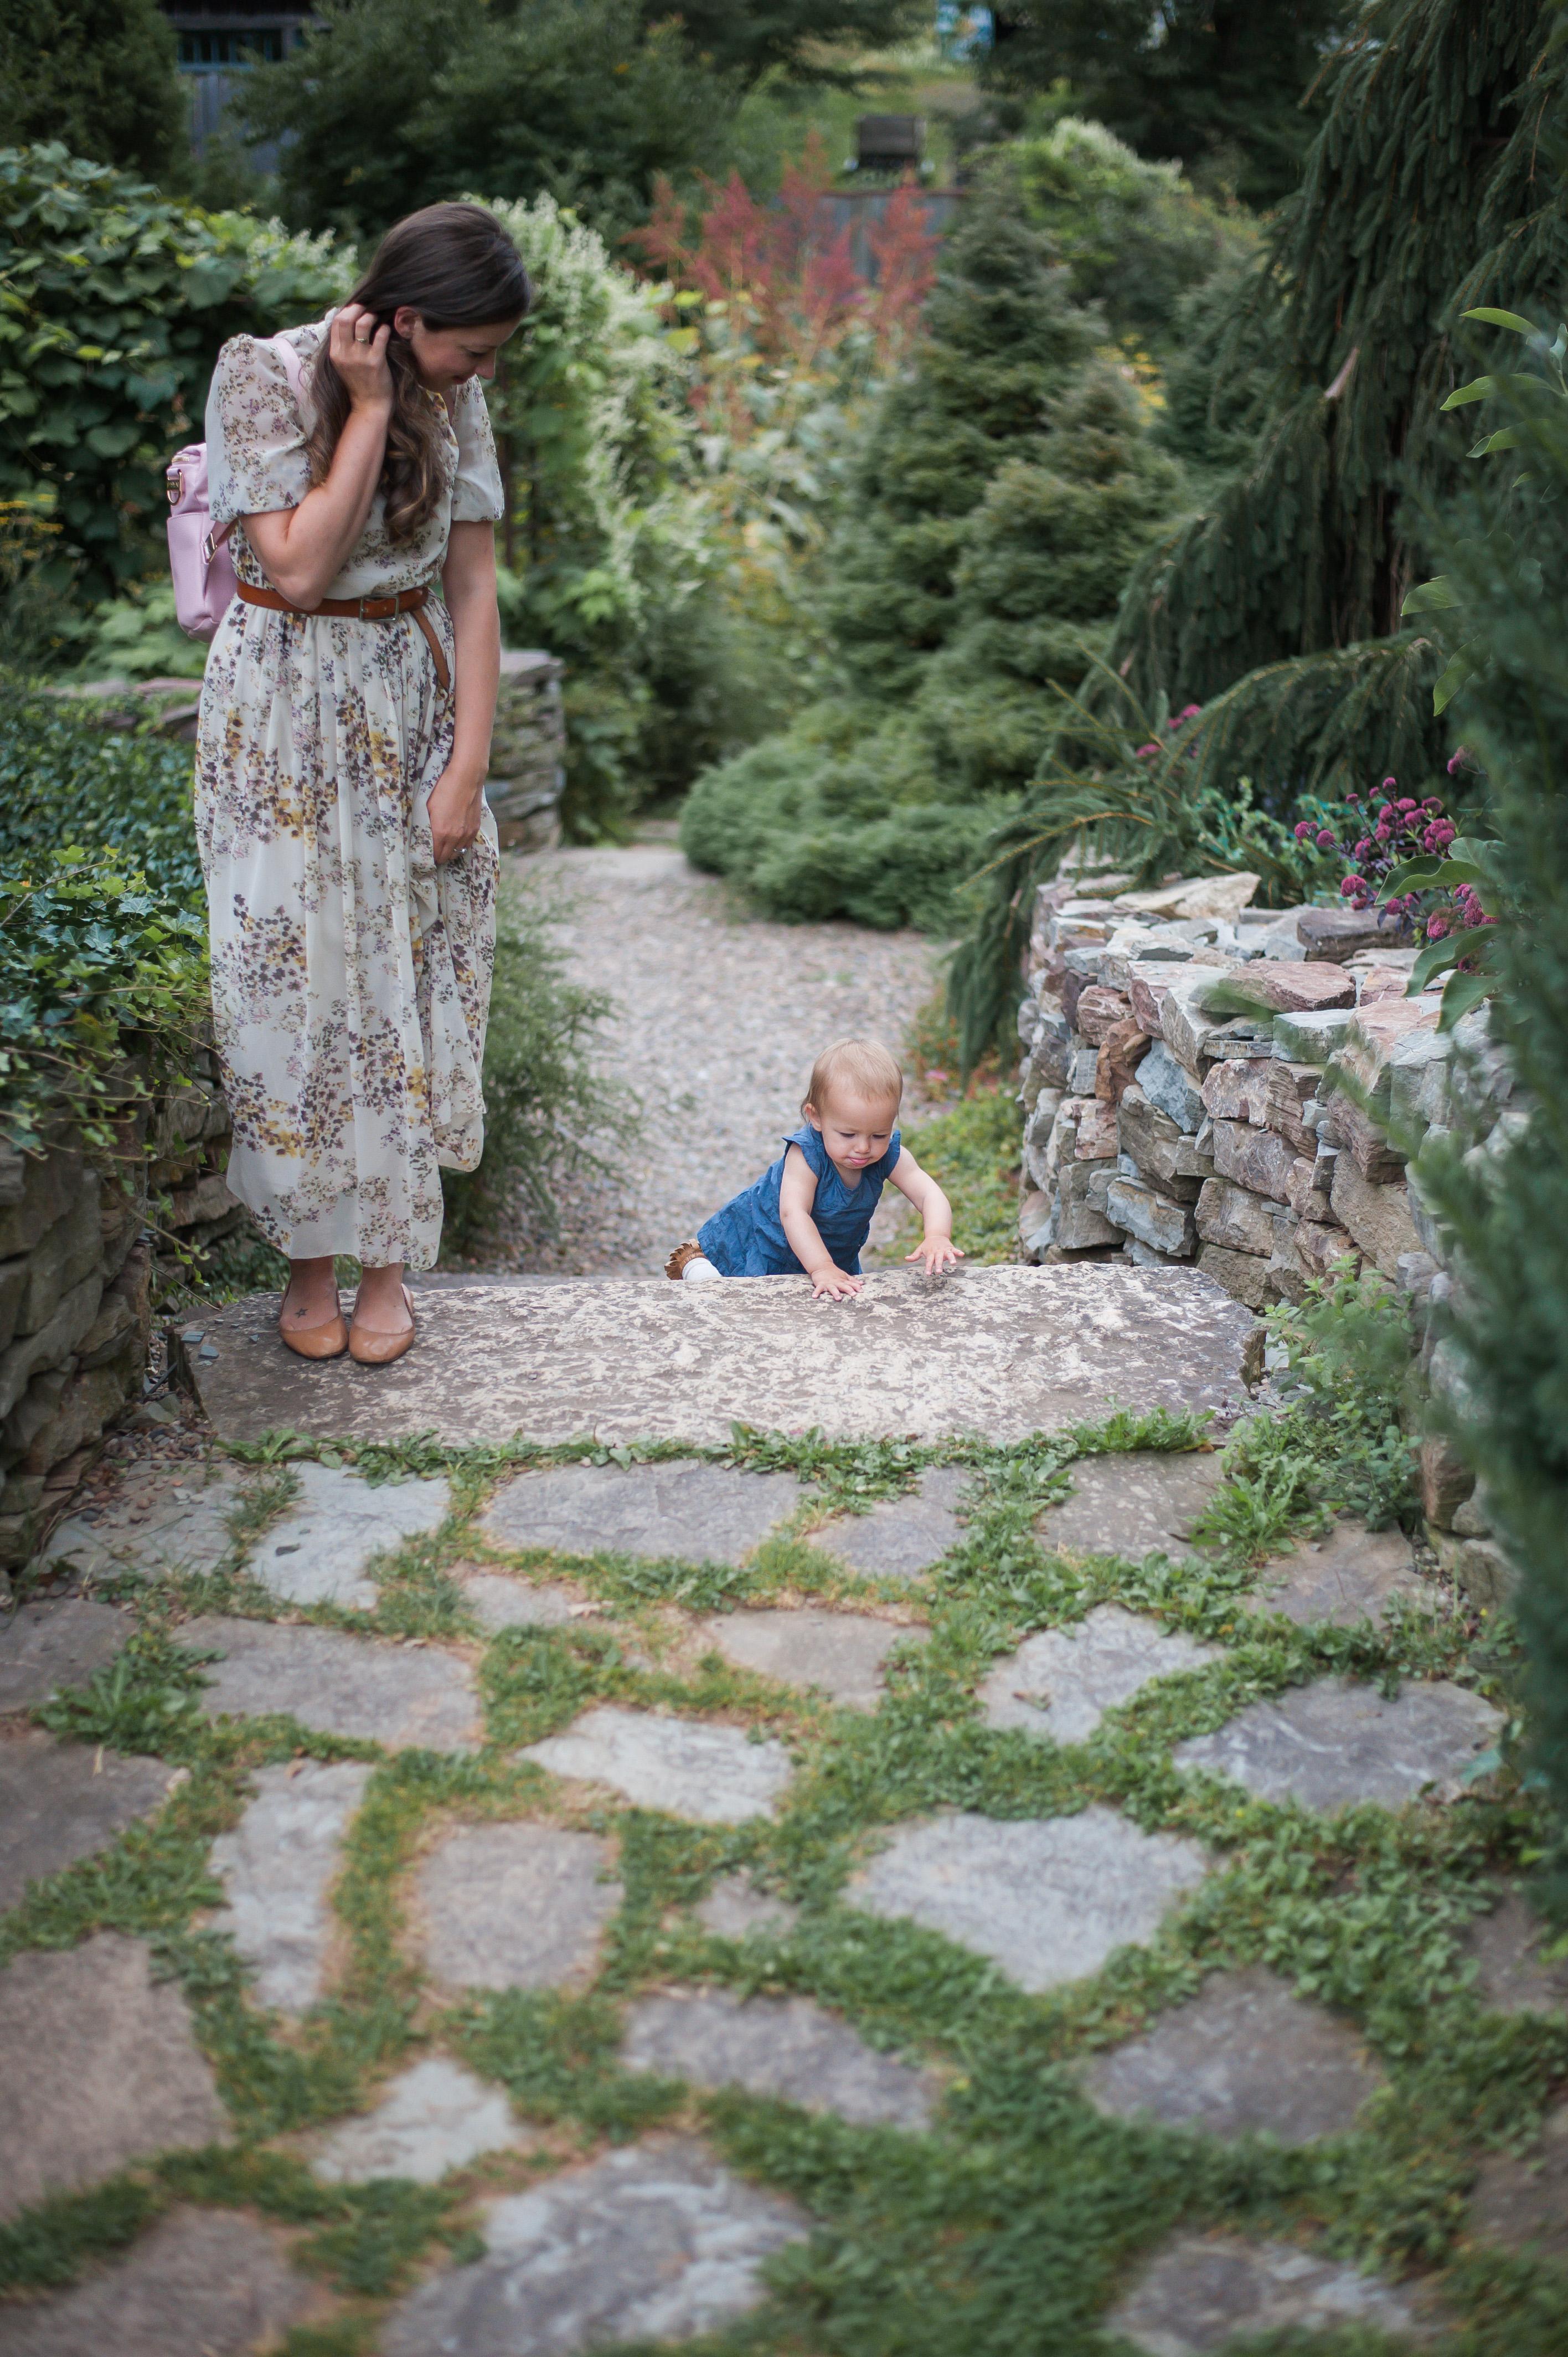 Wild Rosebuds: Trip To Tangled Gardens in Wolfville, Nova Scotia